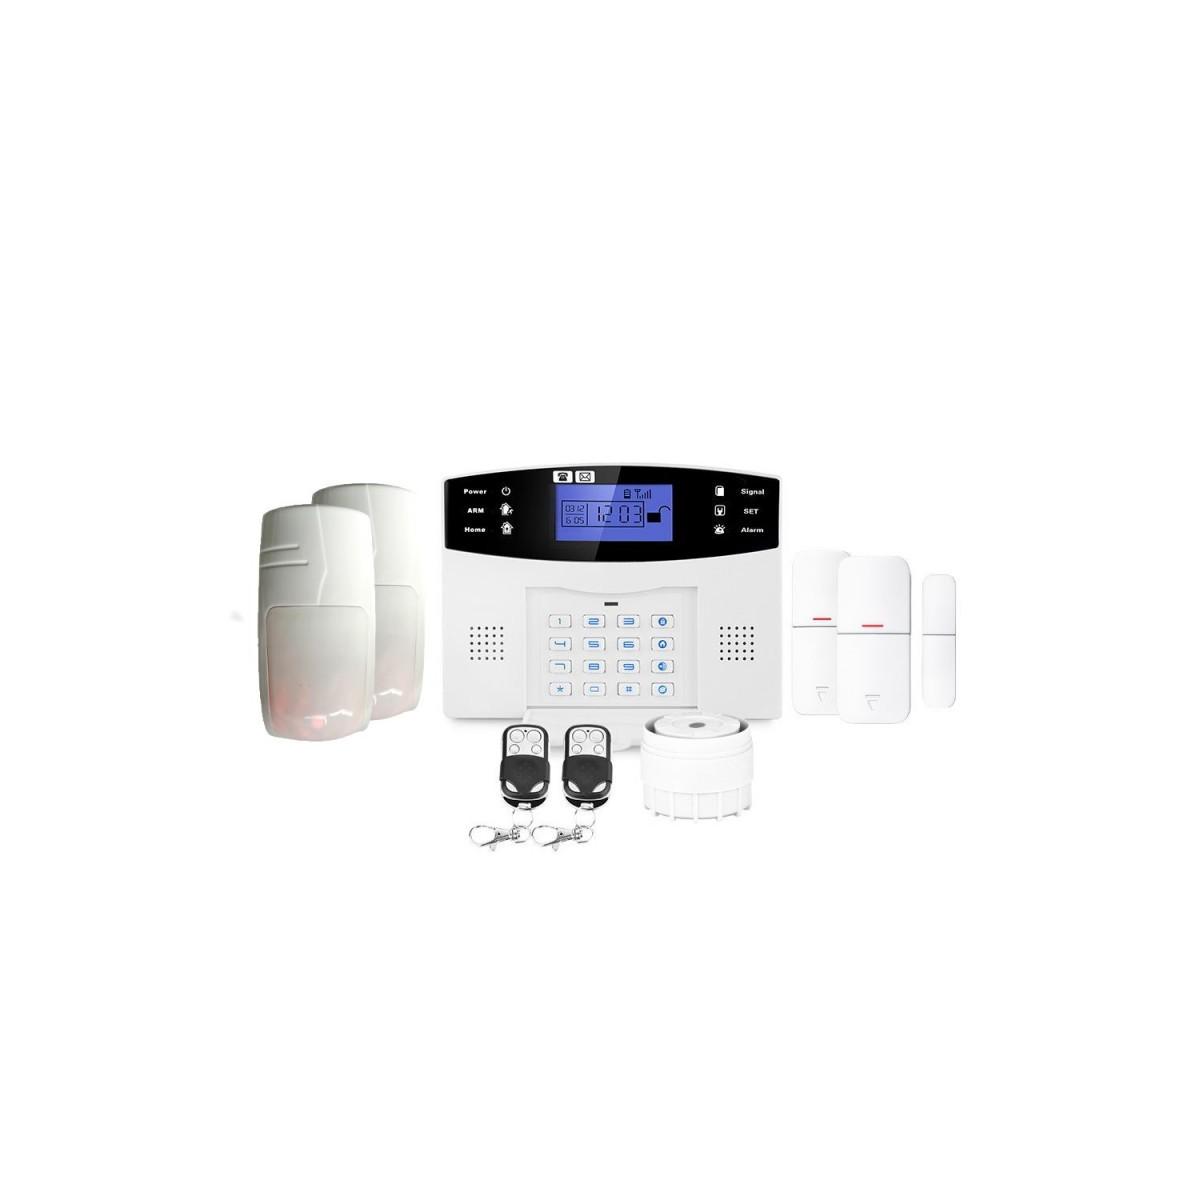 Alarme maison ou appartement sans fil gsm lifebox evolution animal kit-10